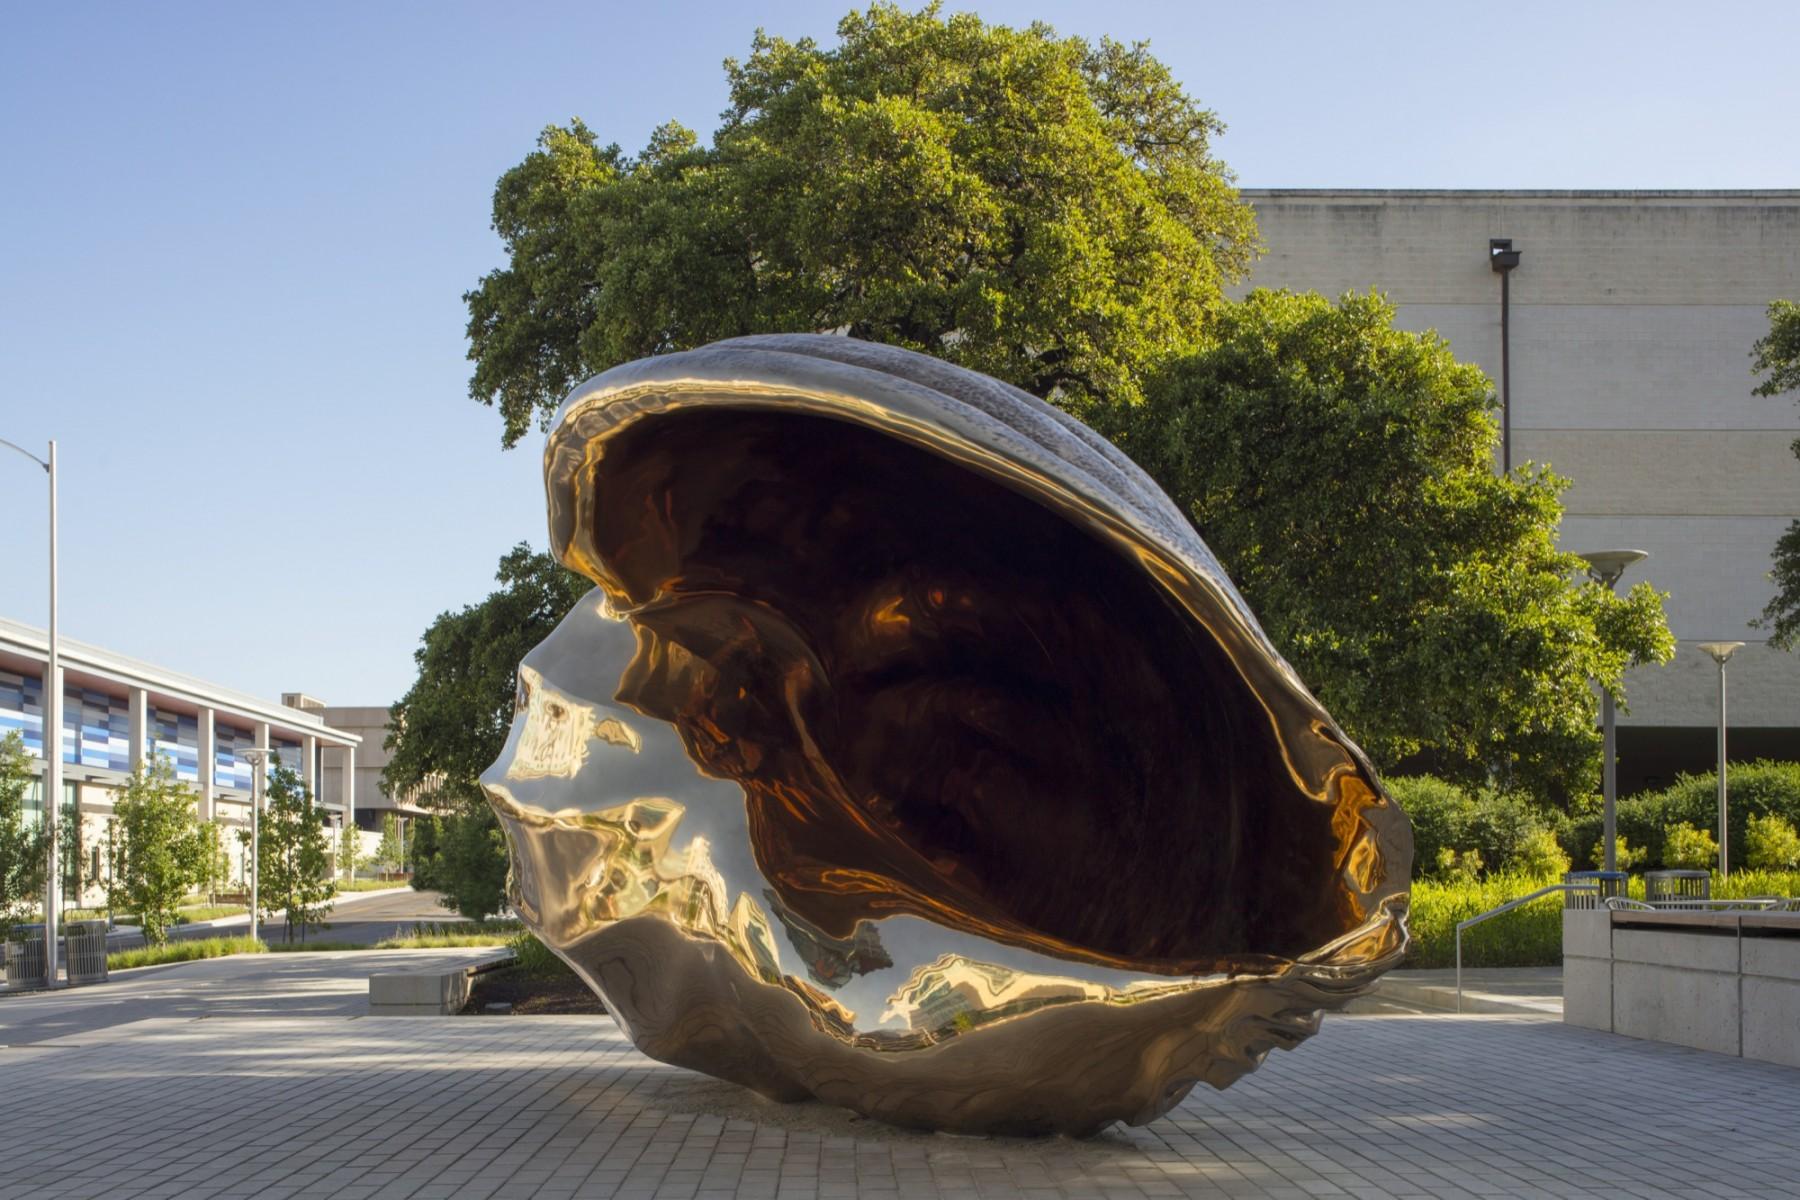 A large shiny bronze shell